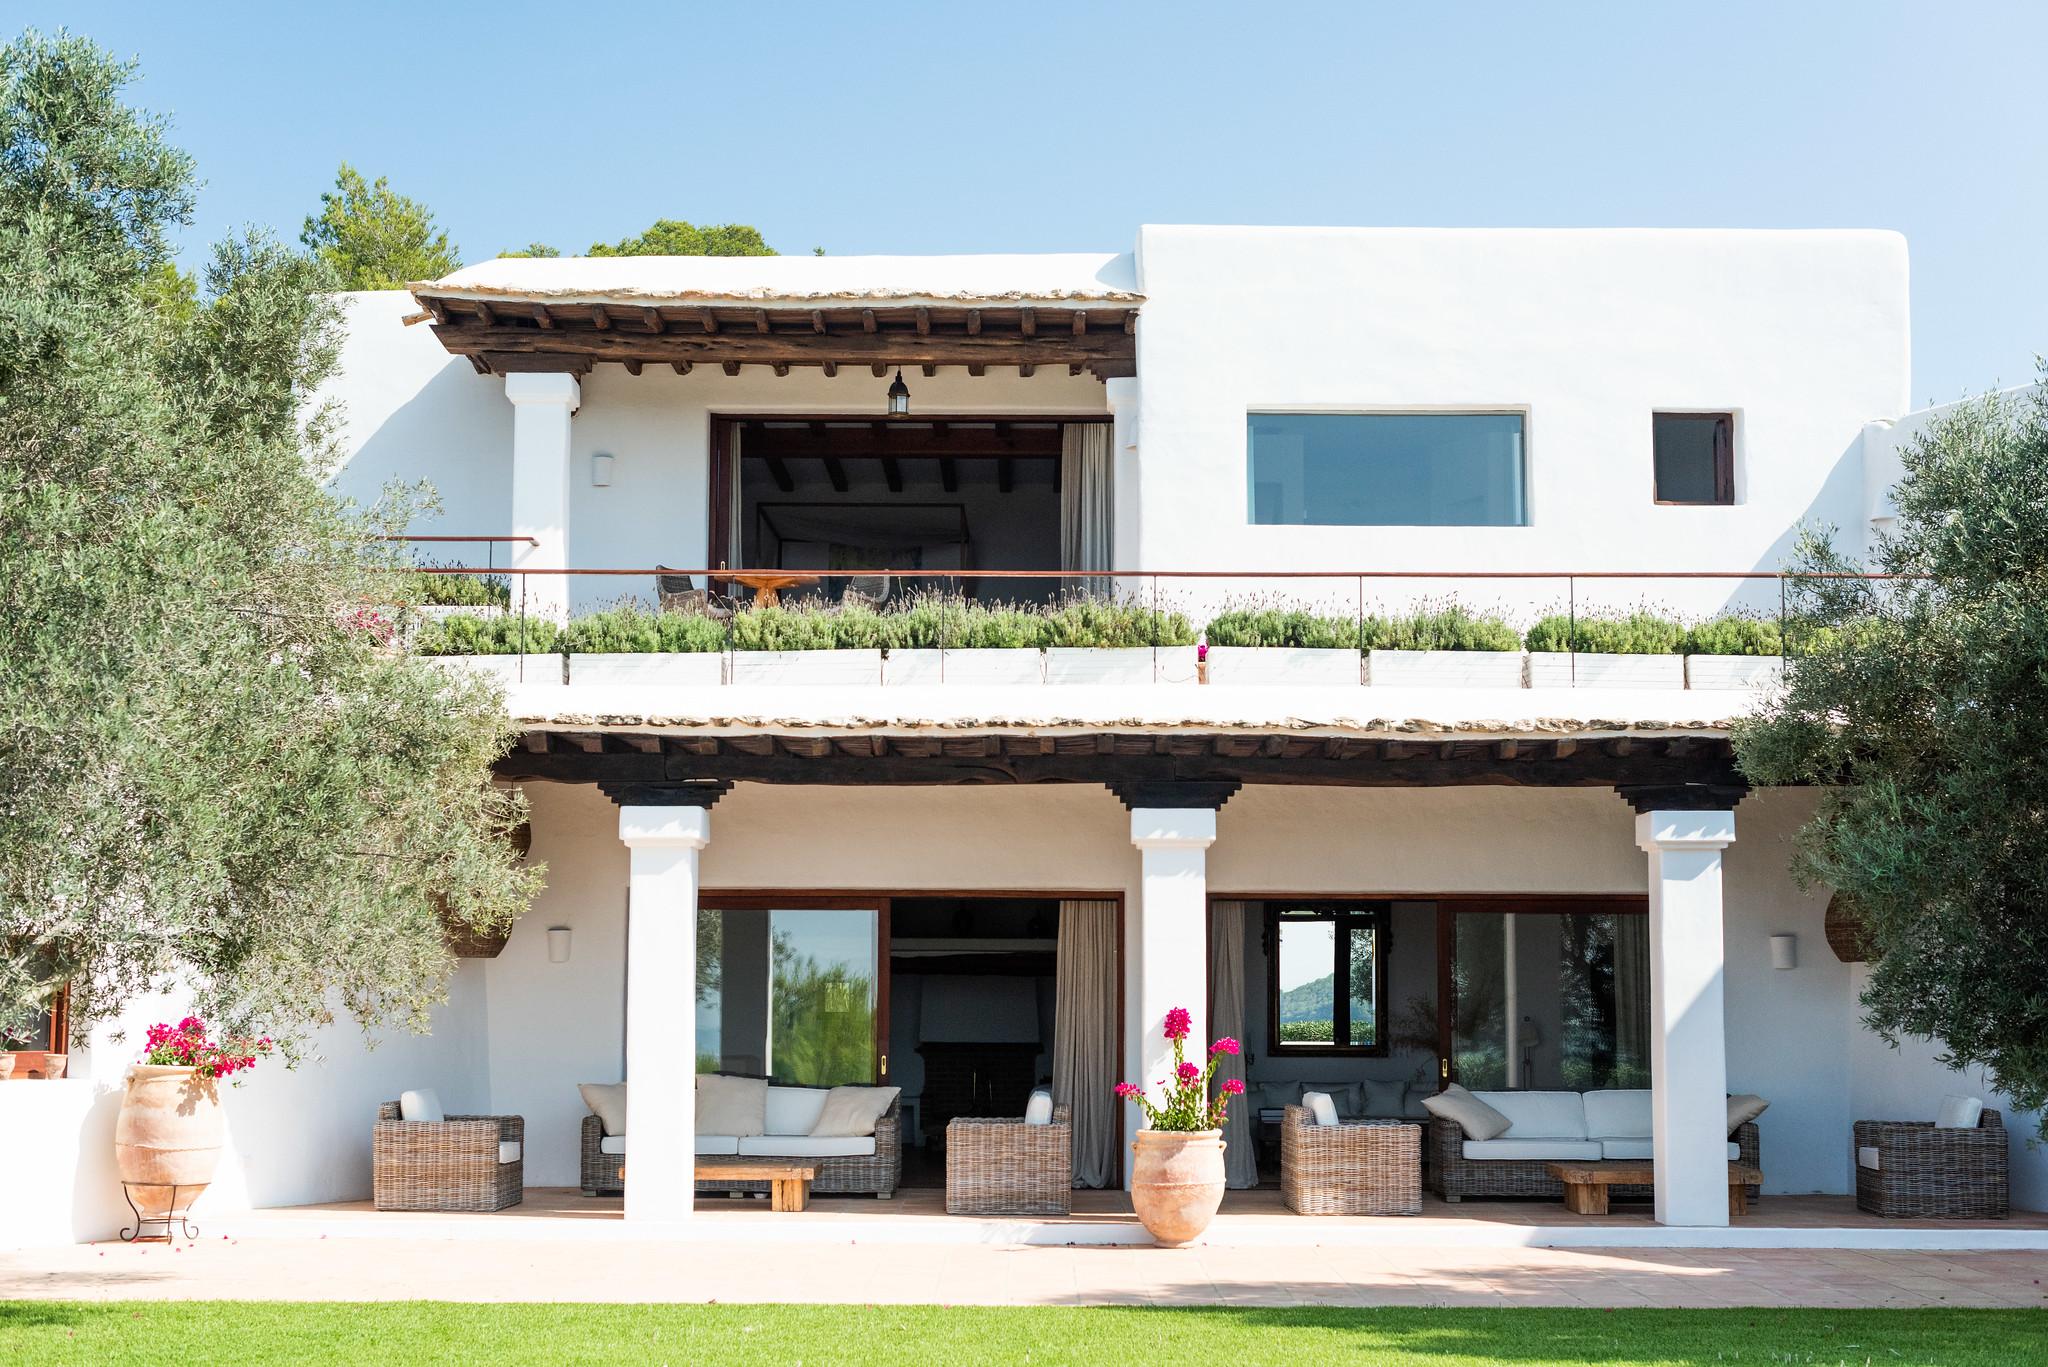 https://www.white-ibiza.com/wp-content/uploads/2020/05/white-ibiza-villas-can-lavanda-view-to-the-house.jpg